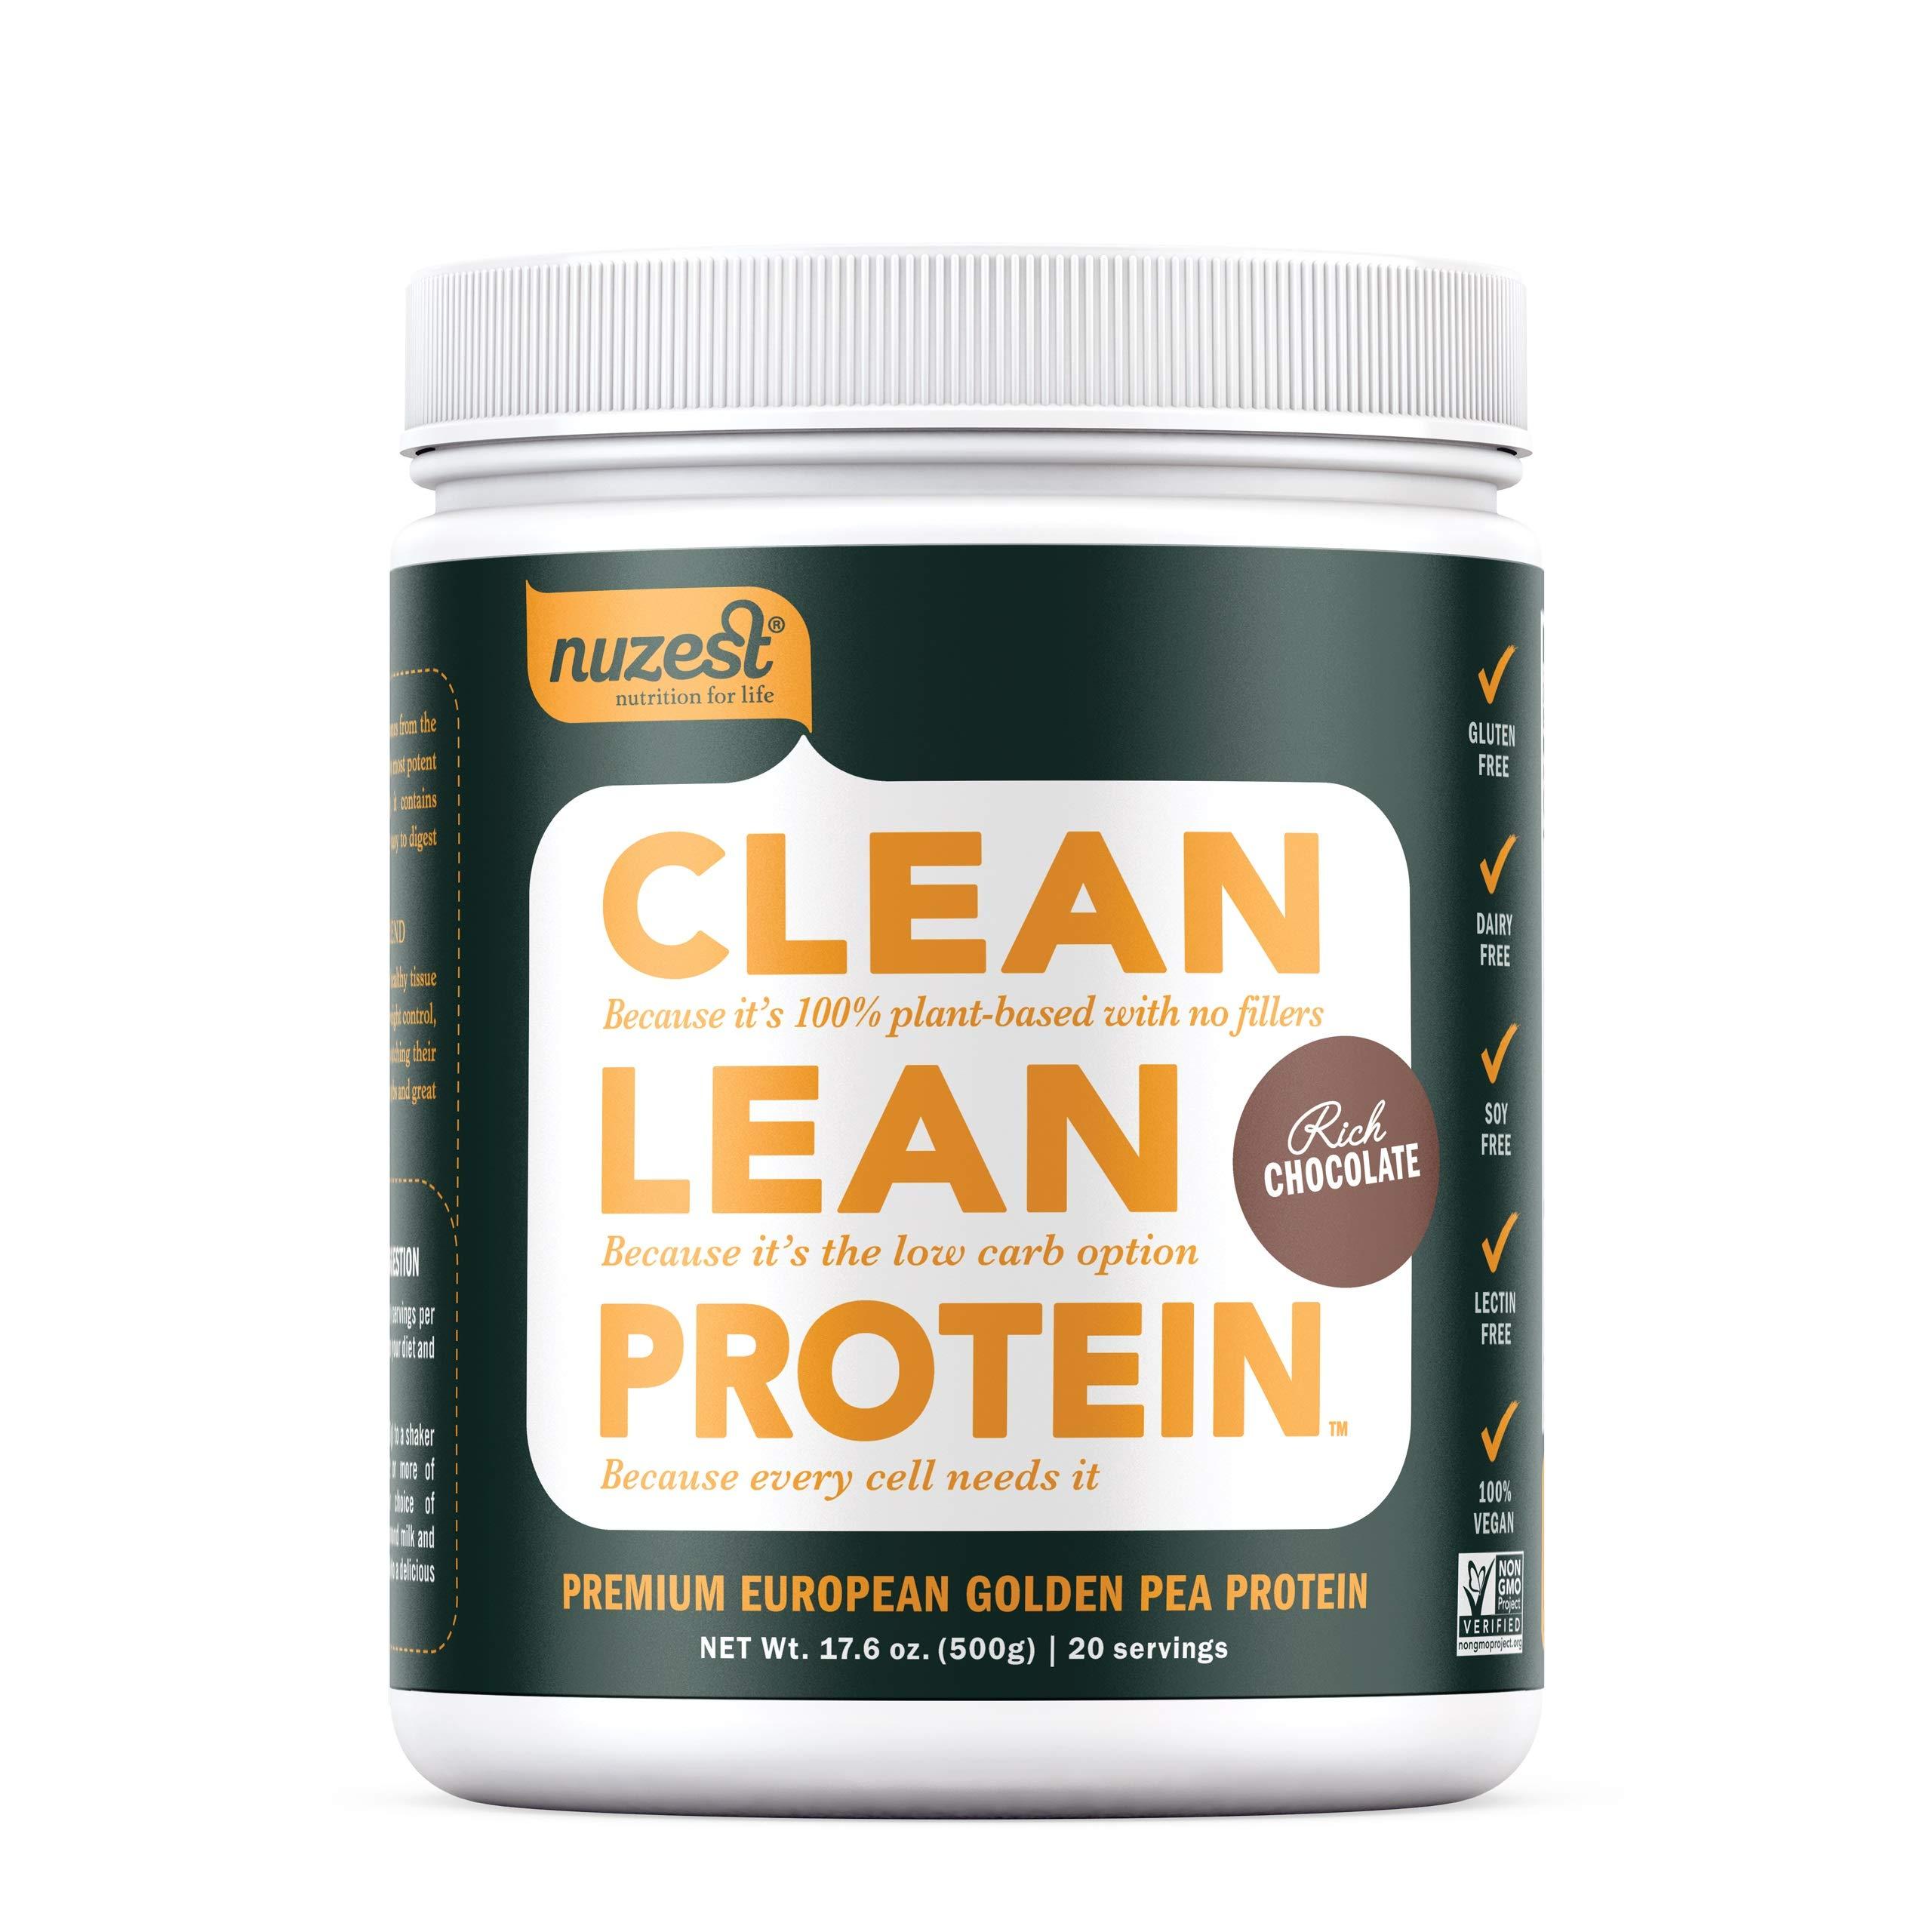 Nuzest Clean Lean Protein - Premium Vegan Protein Powder, Plant Protein Powder, European Golden Pea Protein, Dairy Free, Gluten Free, GMO Free, Naturally Sweetened, Rich Chocolate, 20 Servings, 1.1 lb